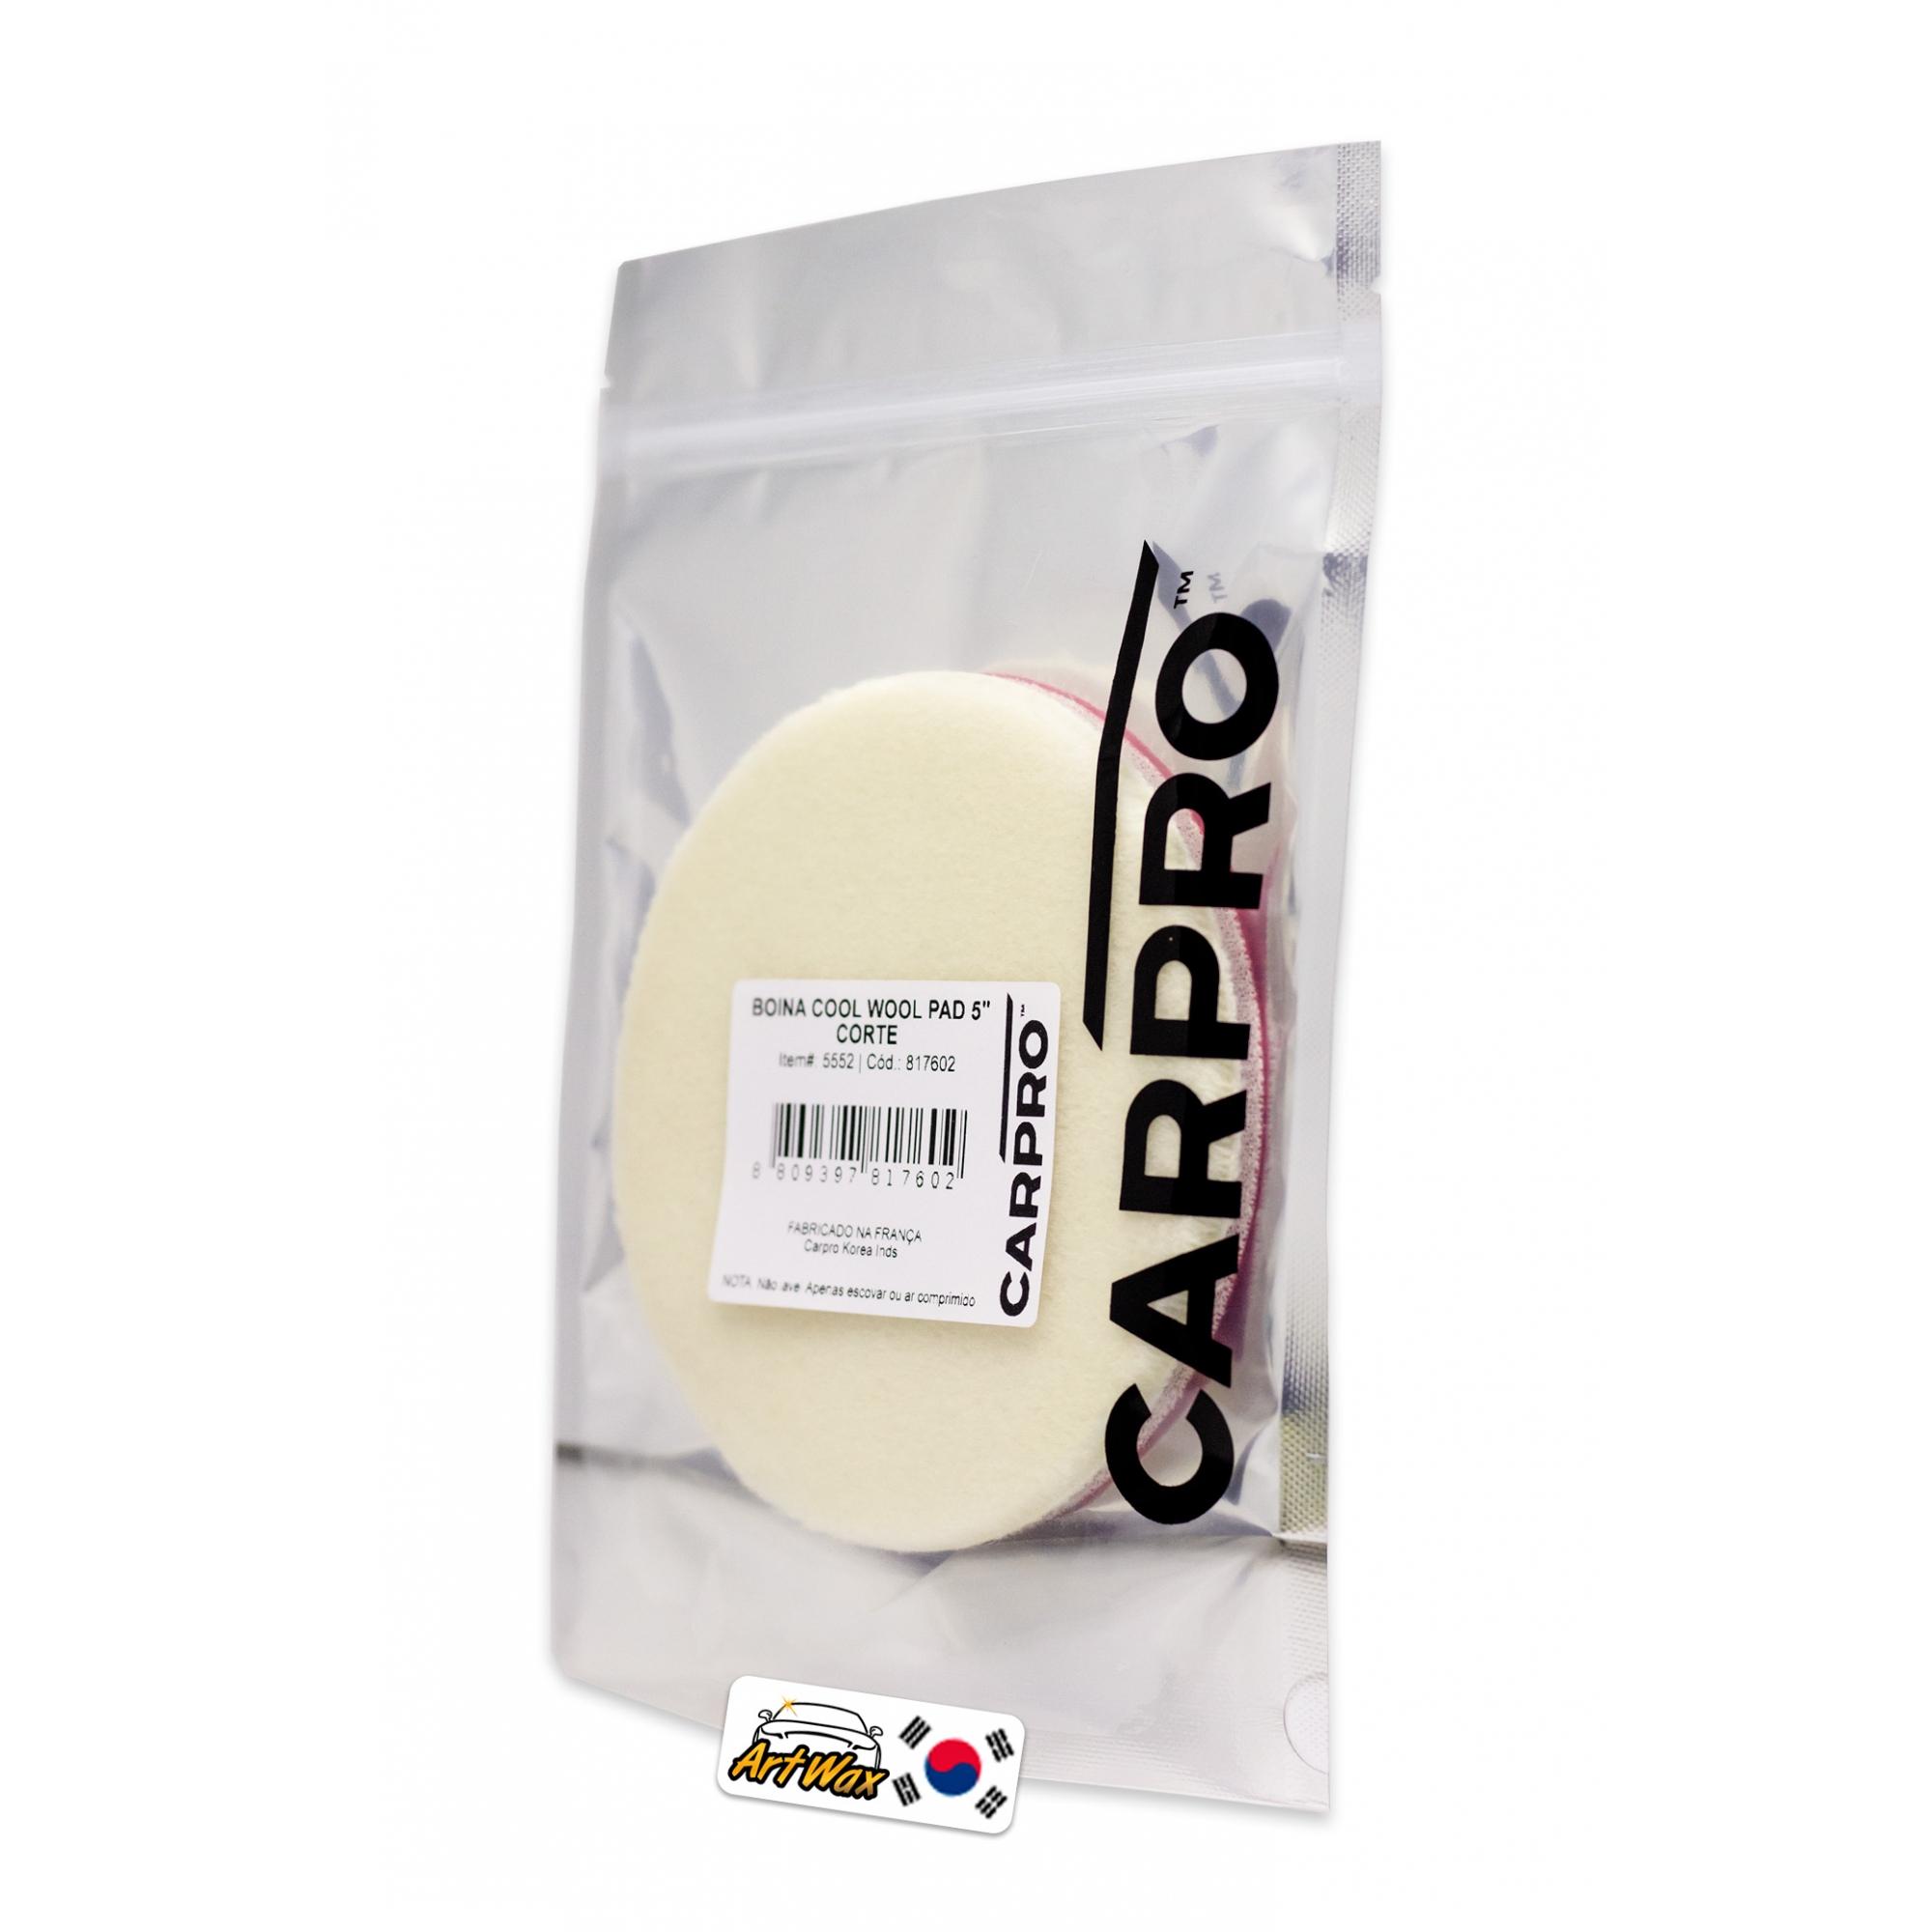 Carpro CoolPad 5